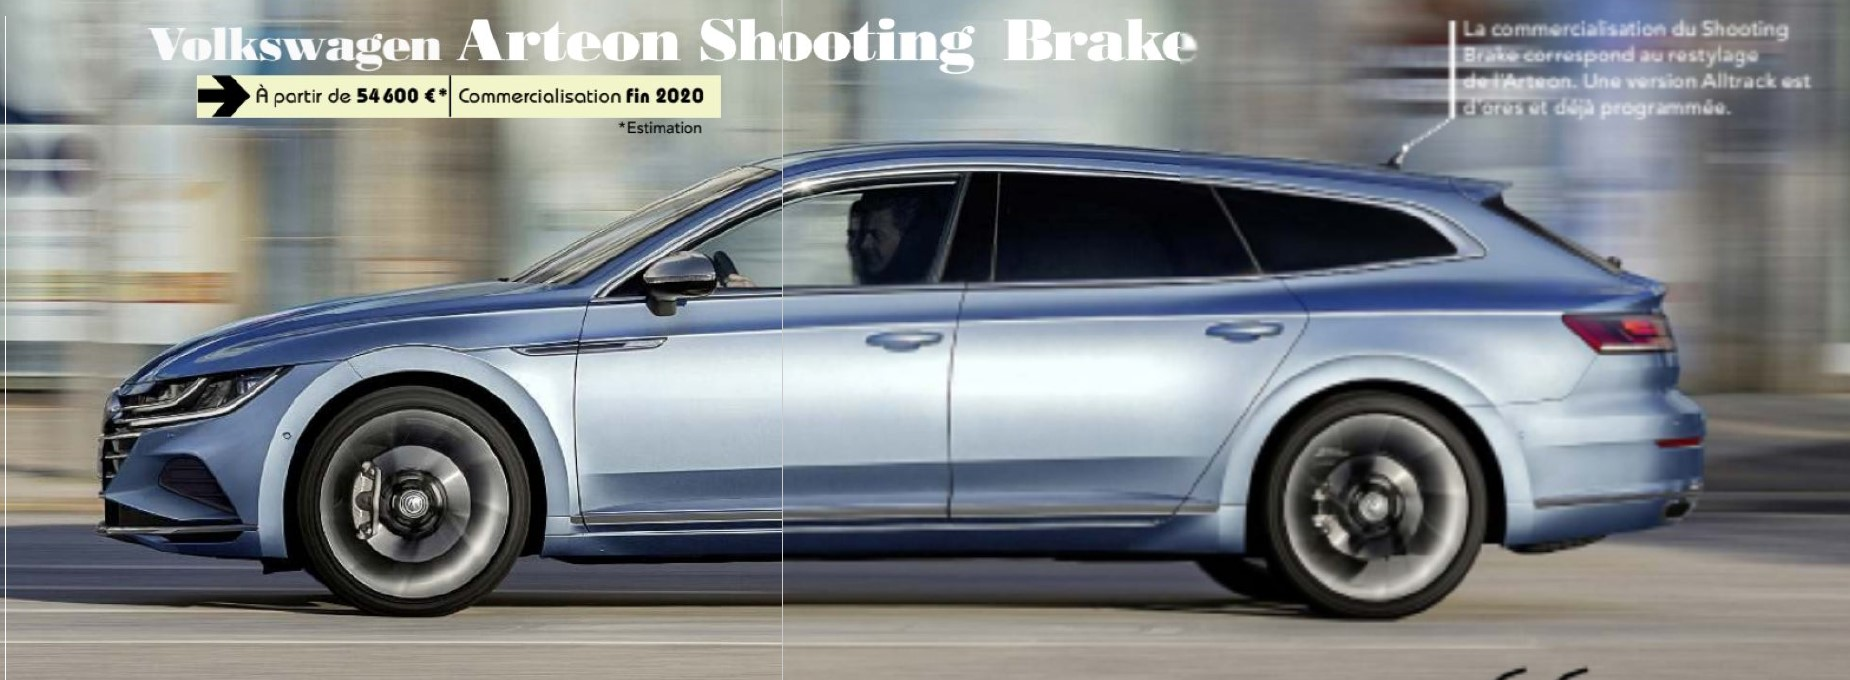 2019 - [Volkswagen] Arteon Shooting Brake - Page 3 Sb10